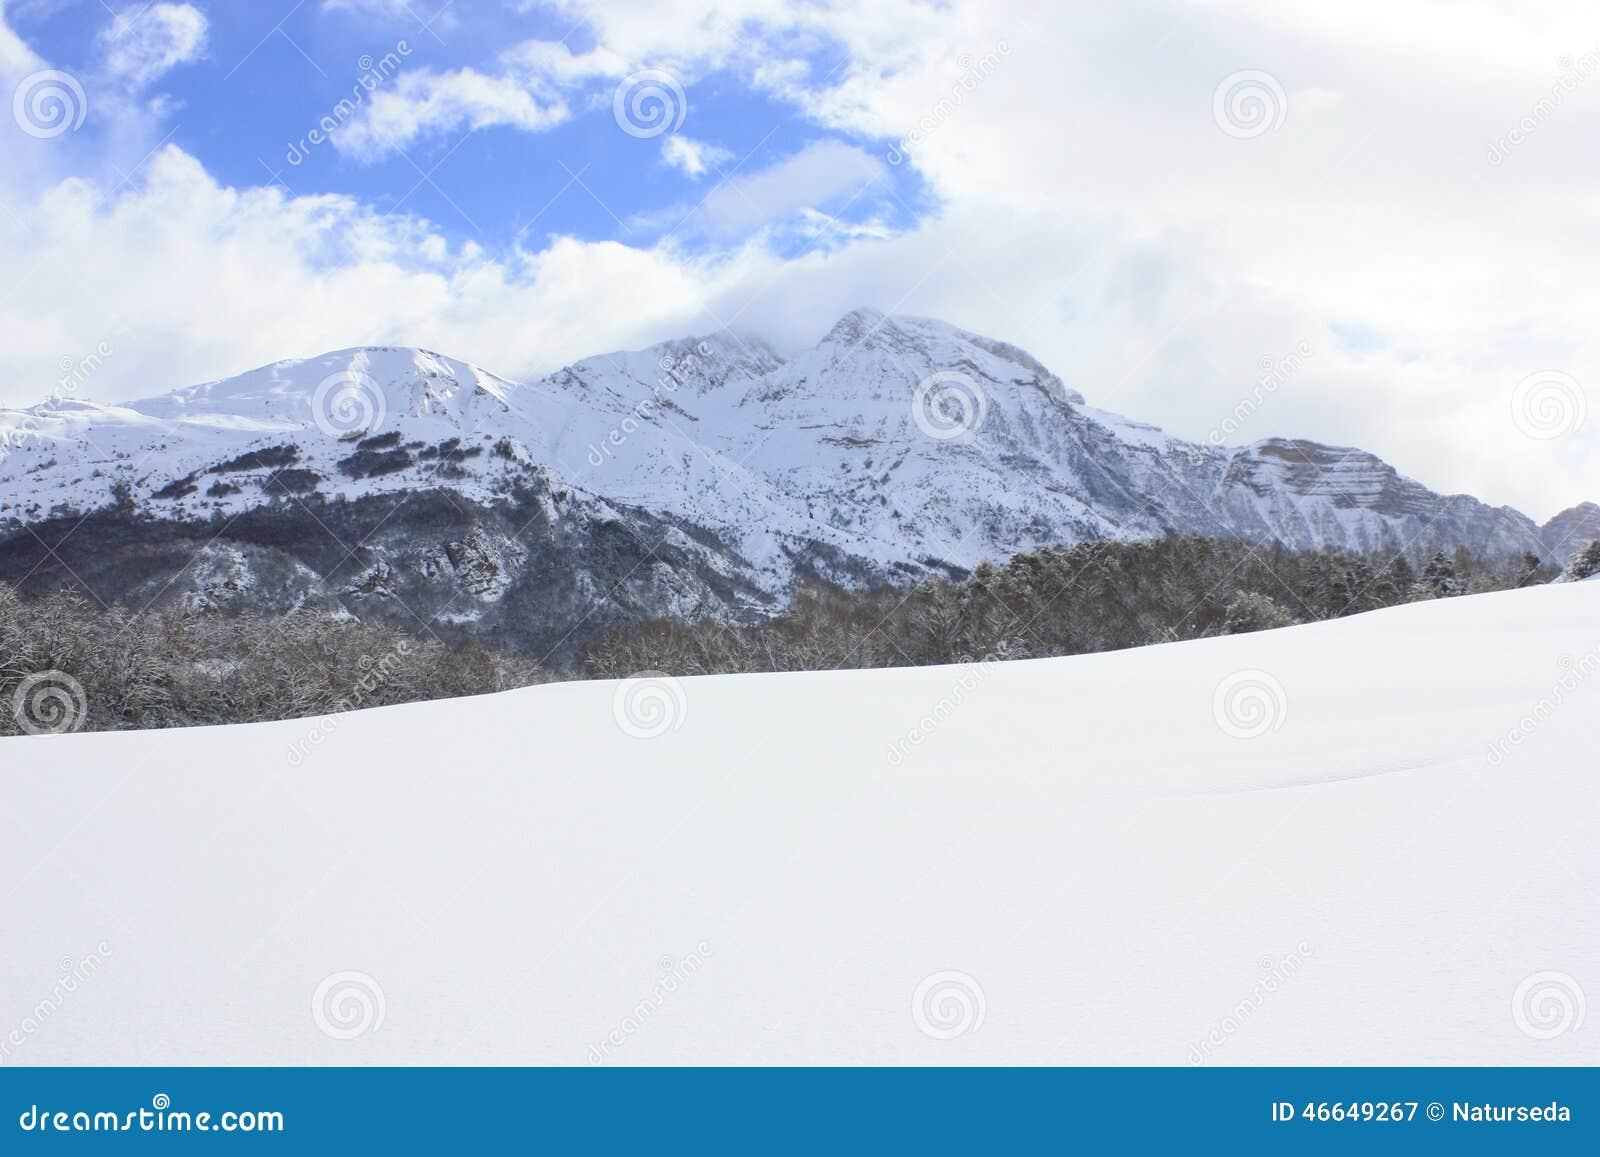 Peñablanca, sneeuwde bergen, de Pyreneeën